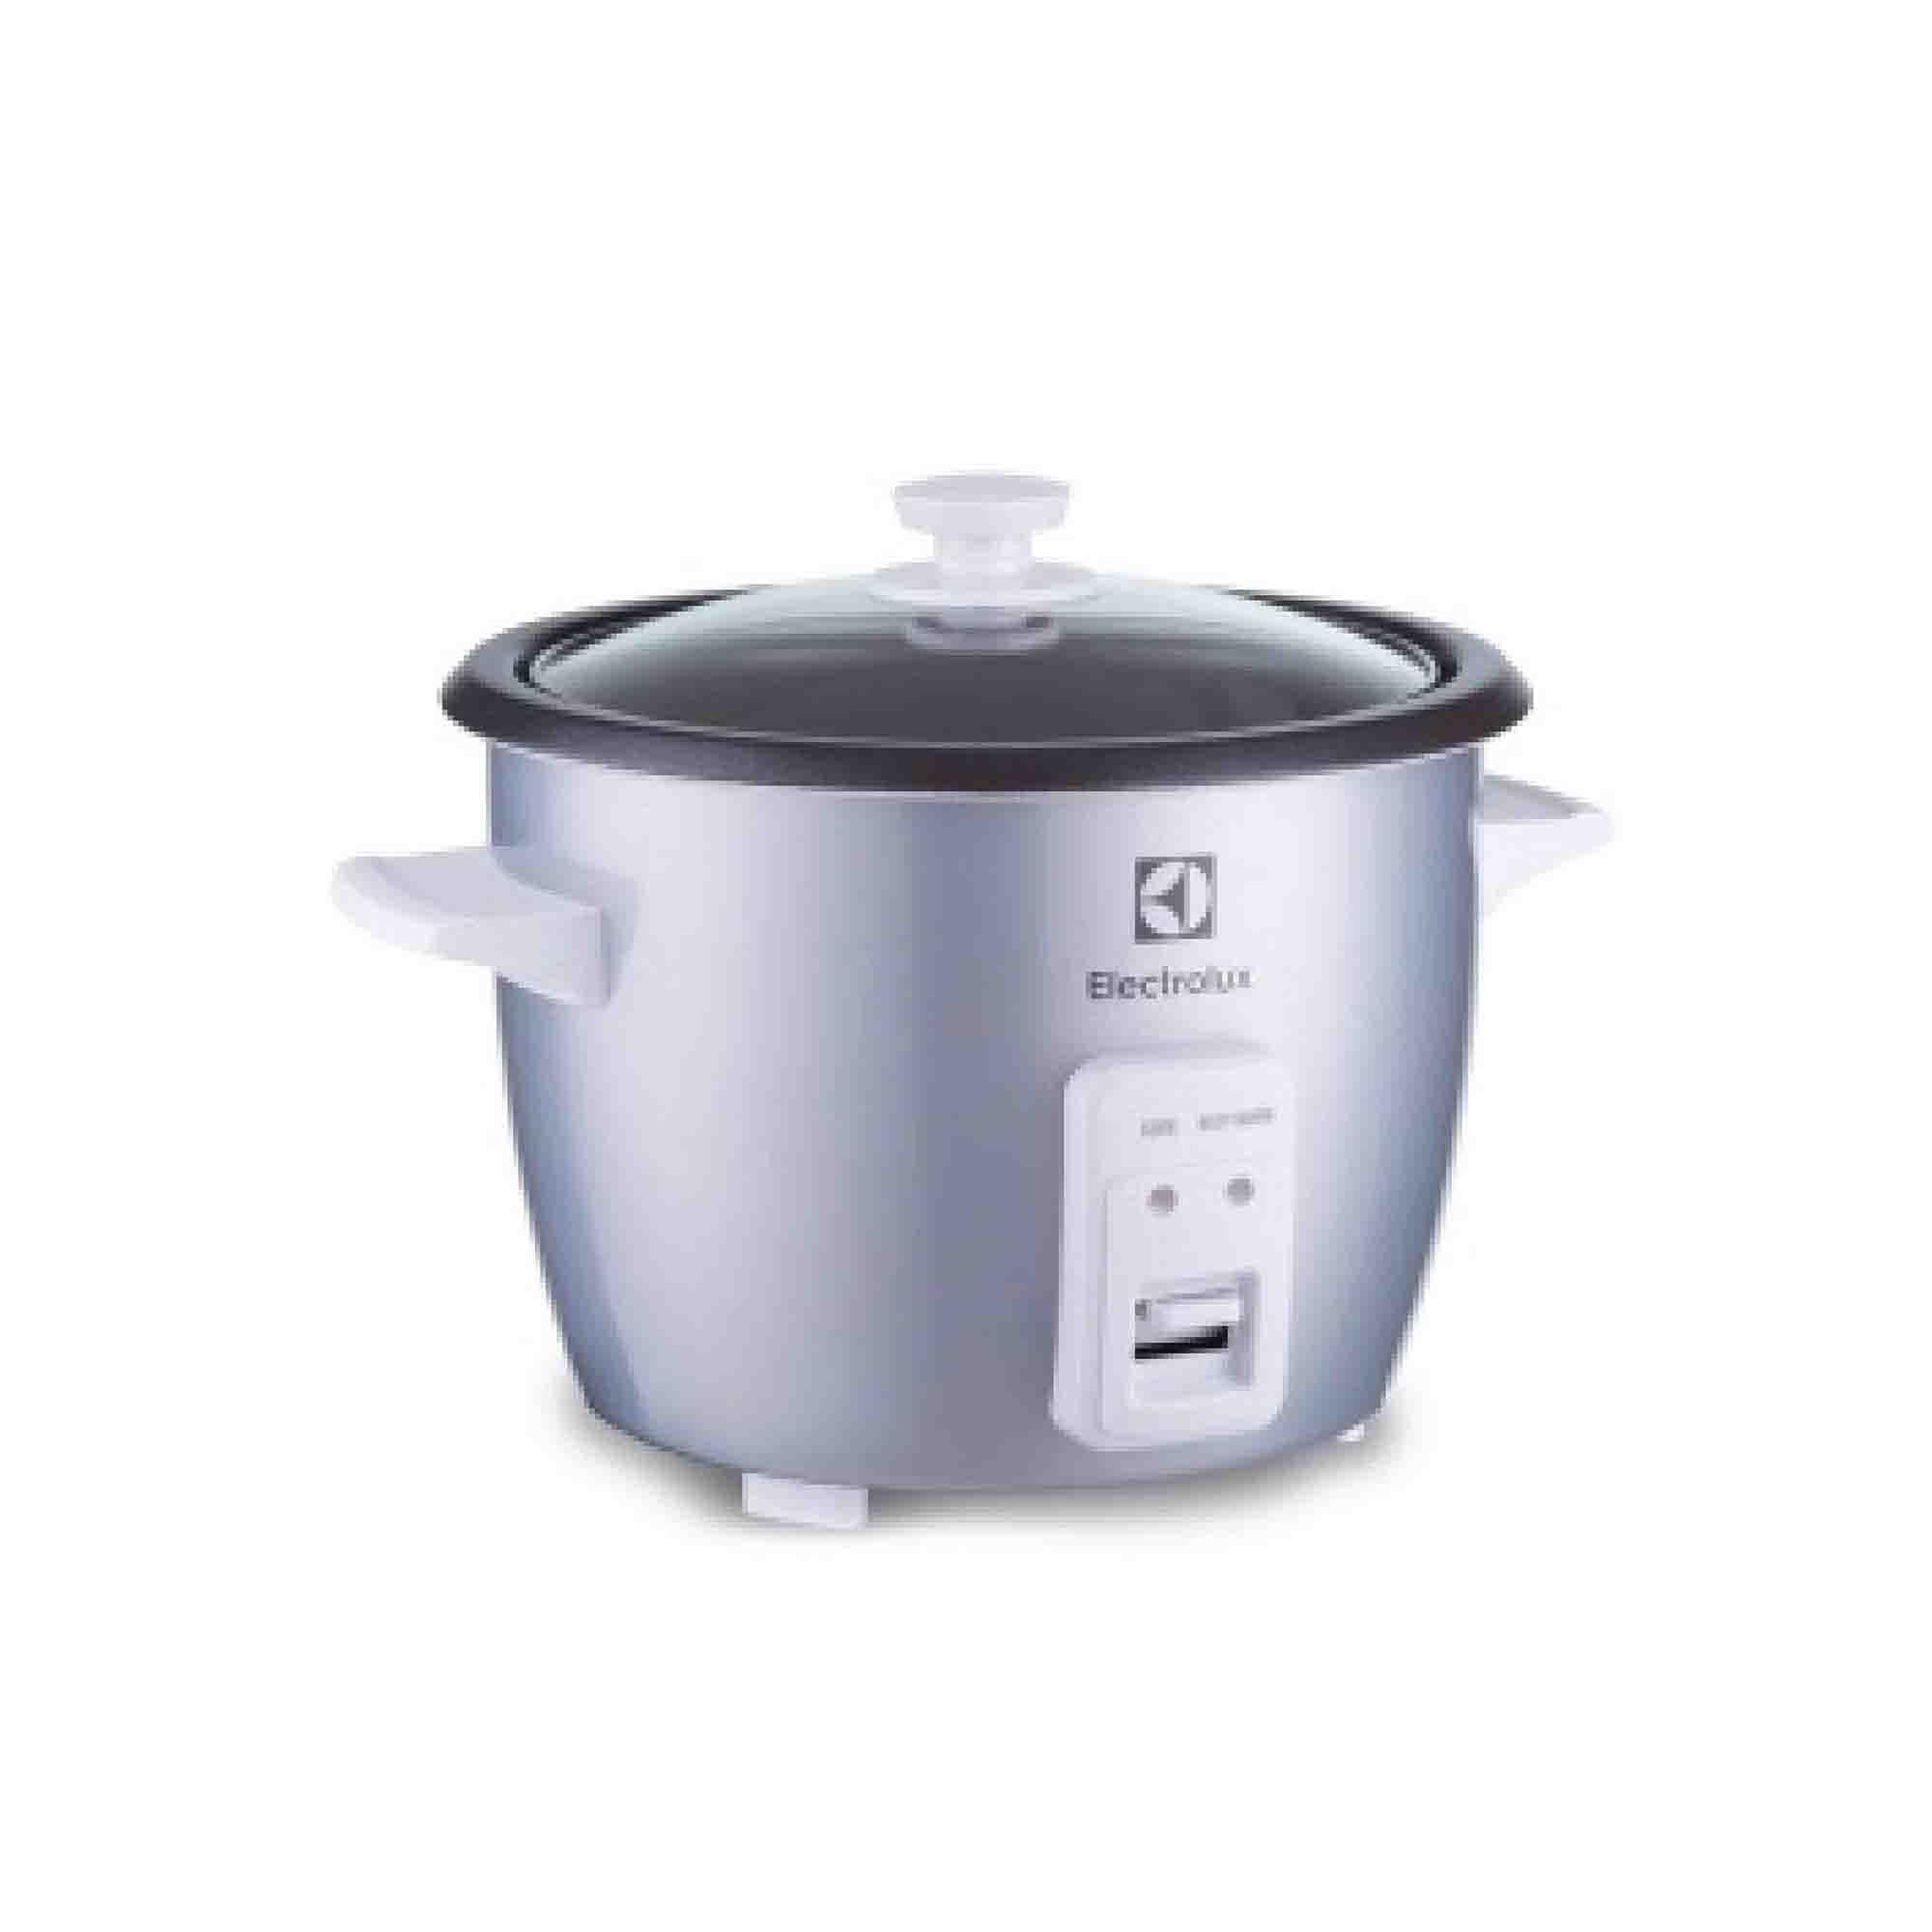 electrolux rice cooker erc1300 1 3l end 5 2 2020 5 01 pm rh lelong com my Wolfgang Puck Rice Cooker Wolfgang Puck Rice Cooker